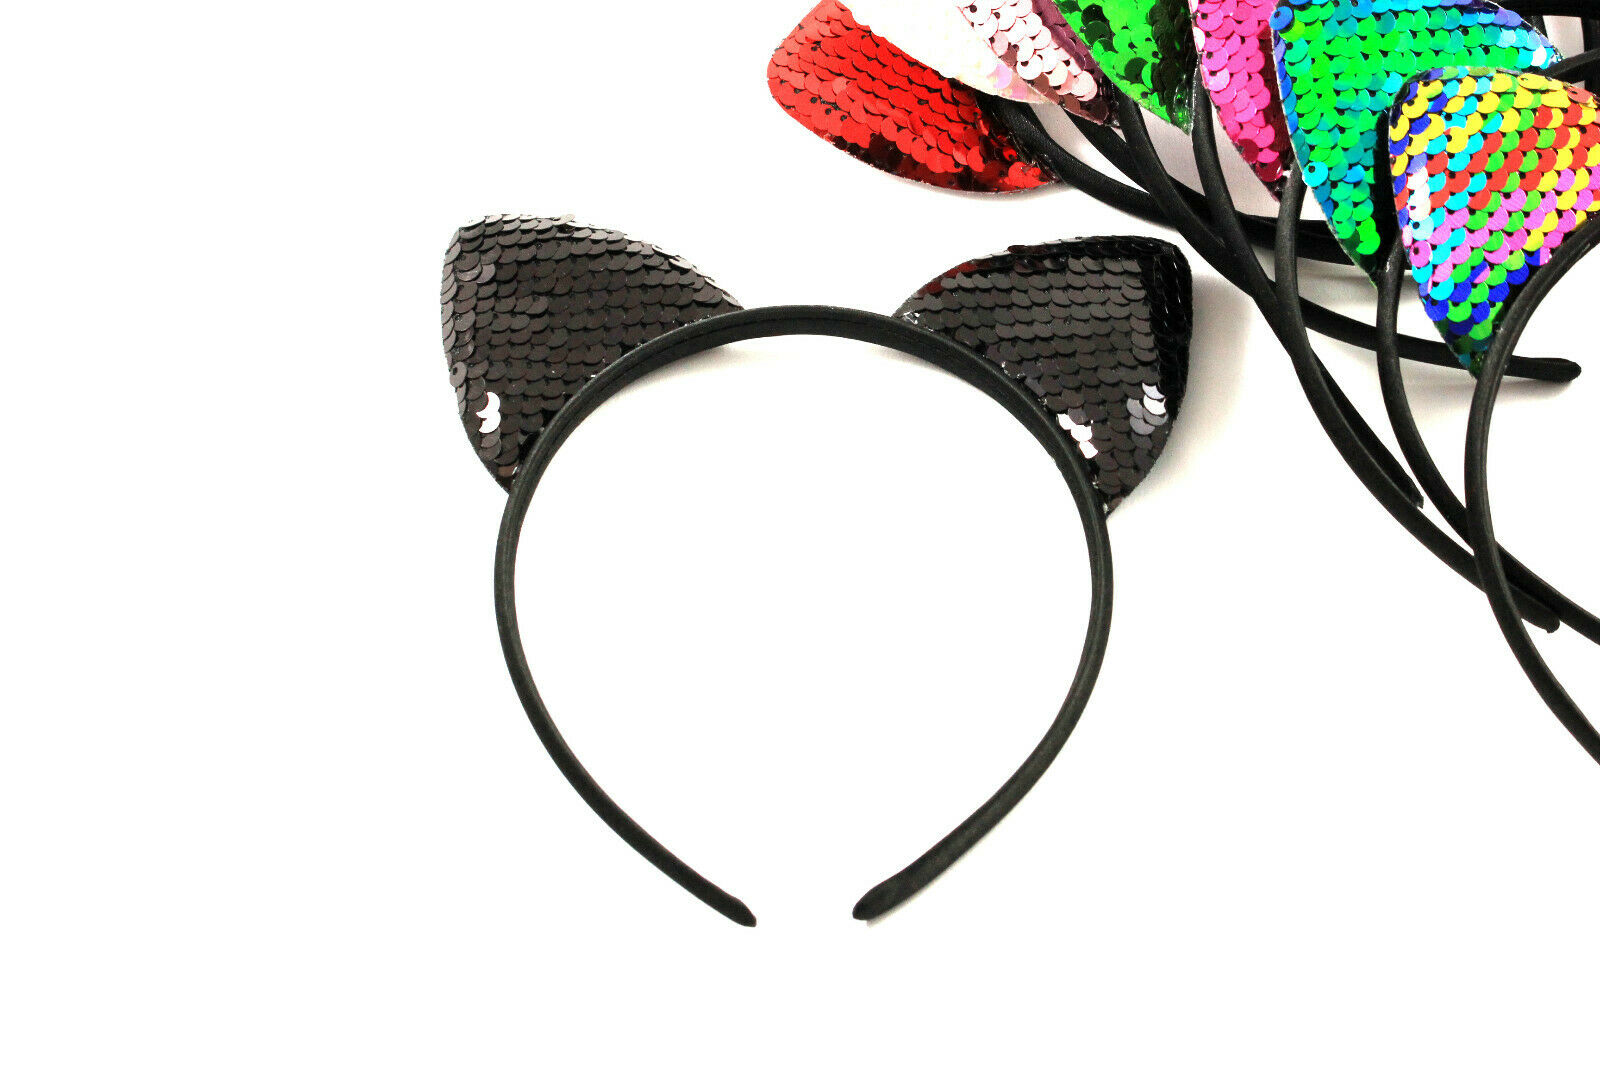 Haarreif Haarreifen Tiara Diadem Katzenohren Pailletten Haarschmuck K218a